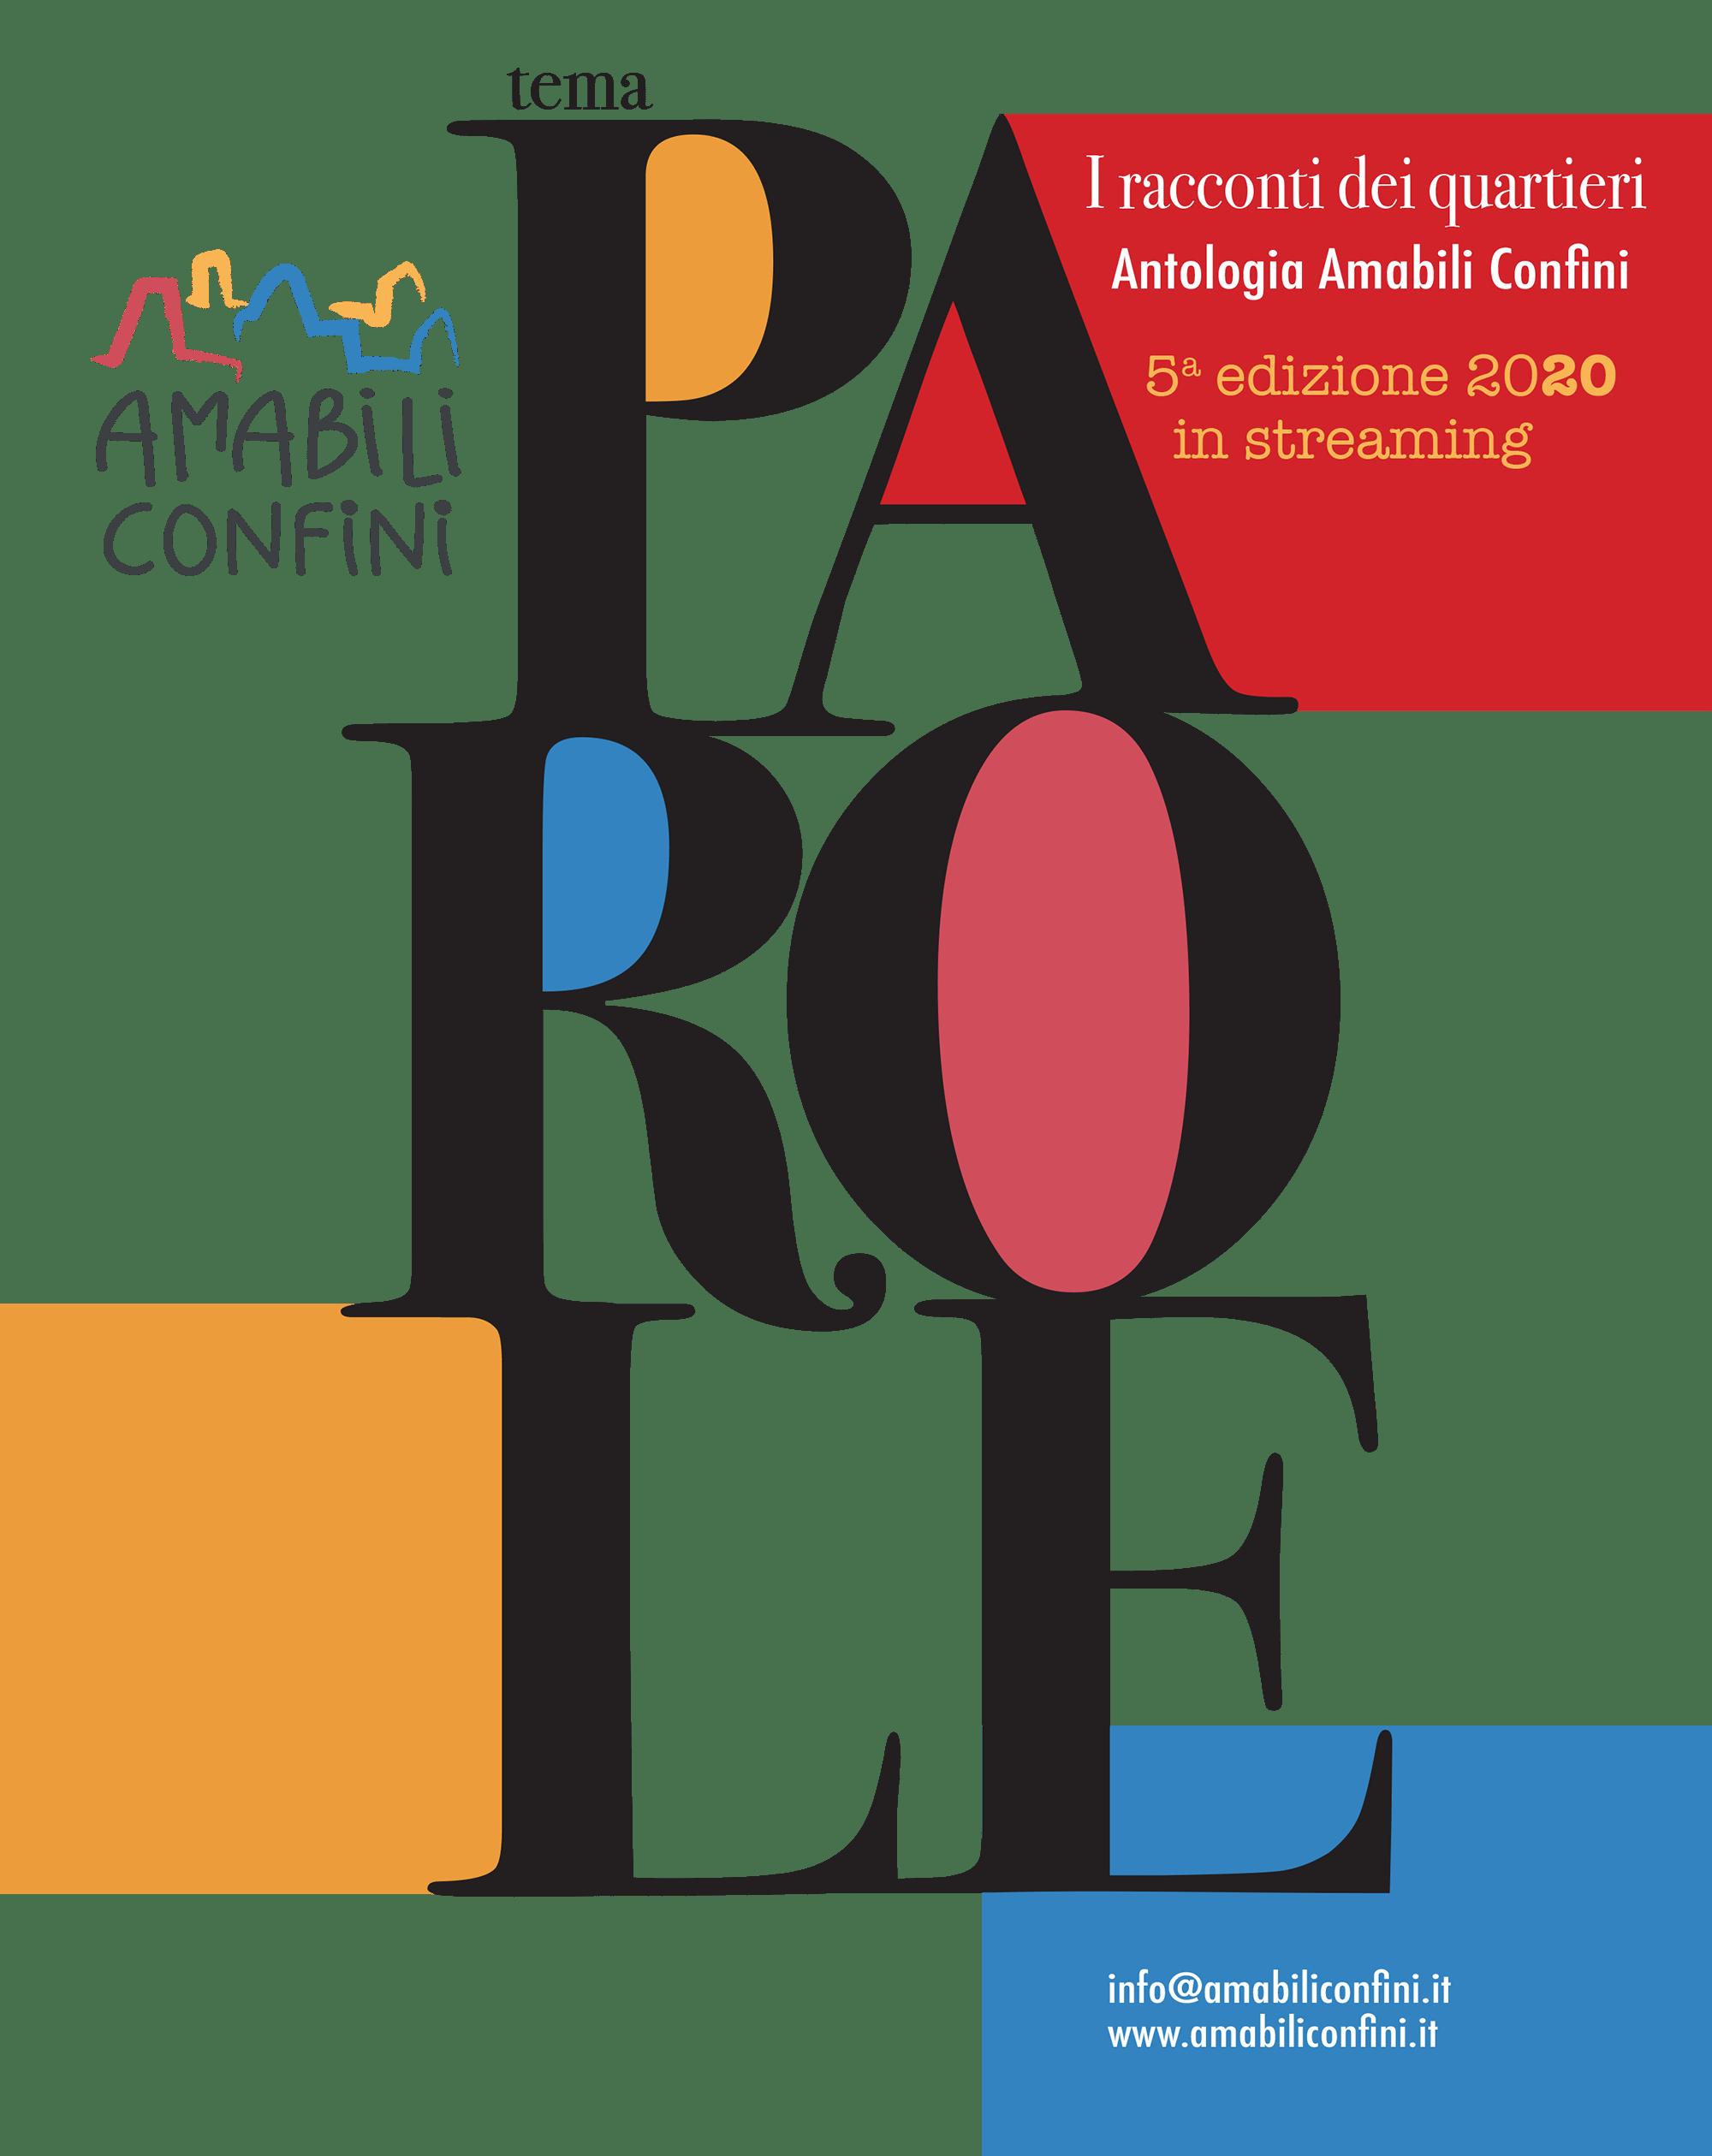 Antologia Amabili Confini 2020 - Copertina